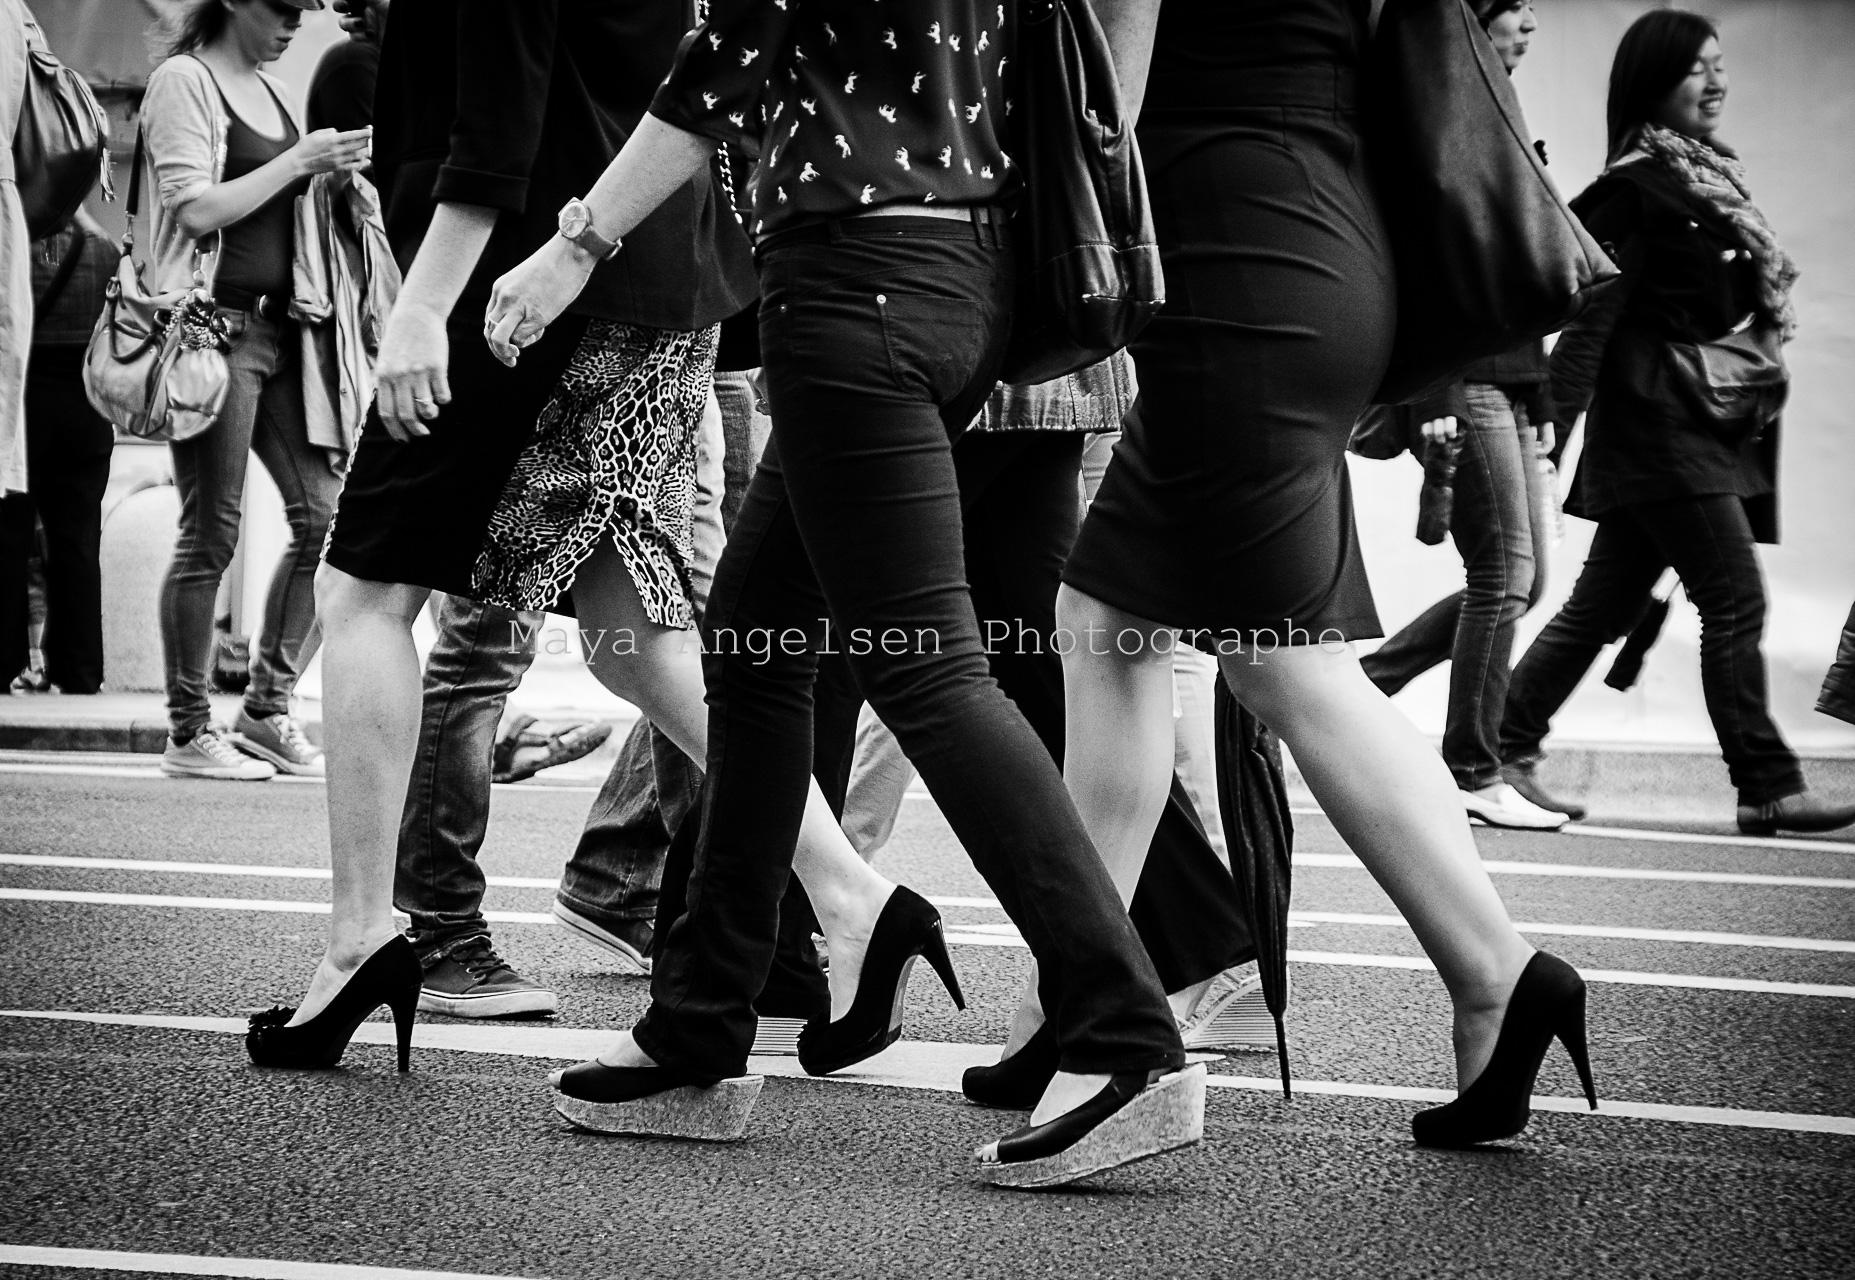 Photographe-Streetphoto-Maya-Angelsen-En-marche